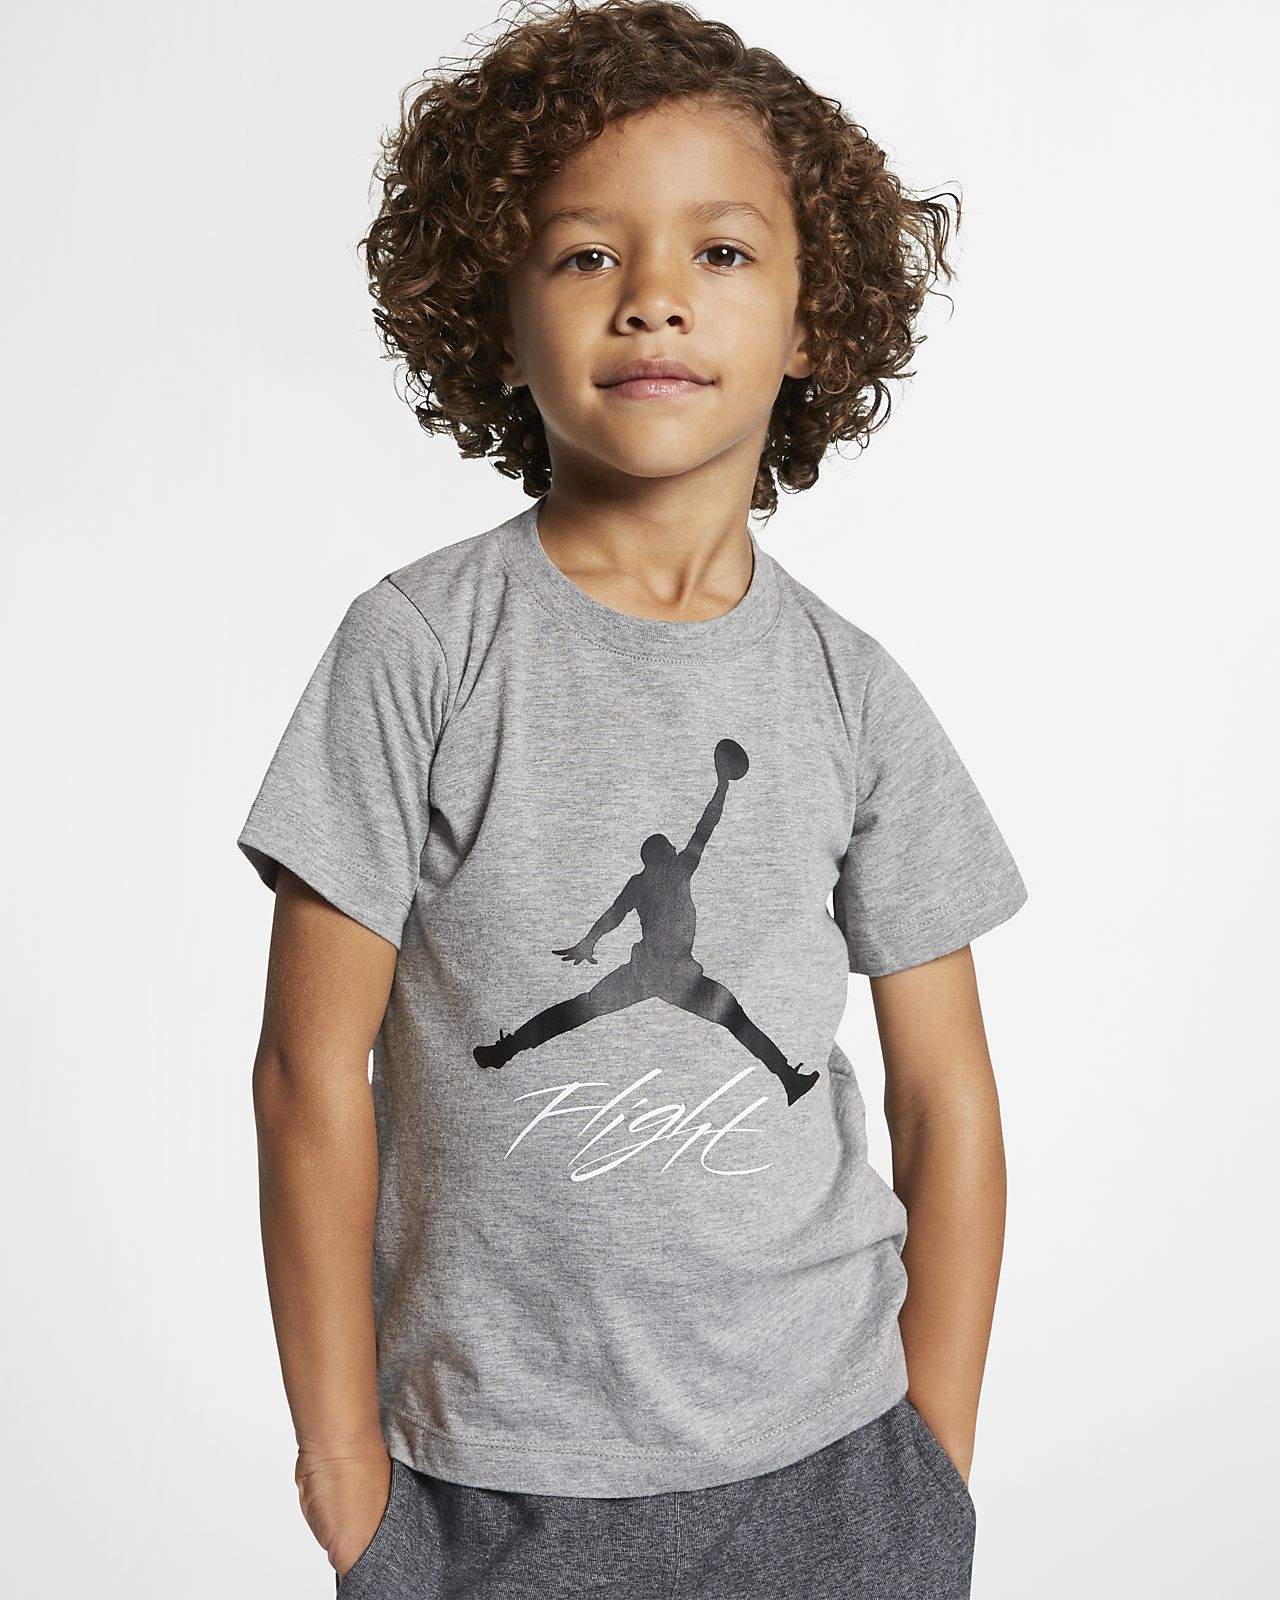 Tee-shirt Jordan Jumpman Flight pour Jeune enfant